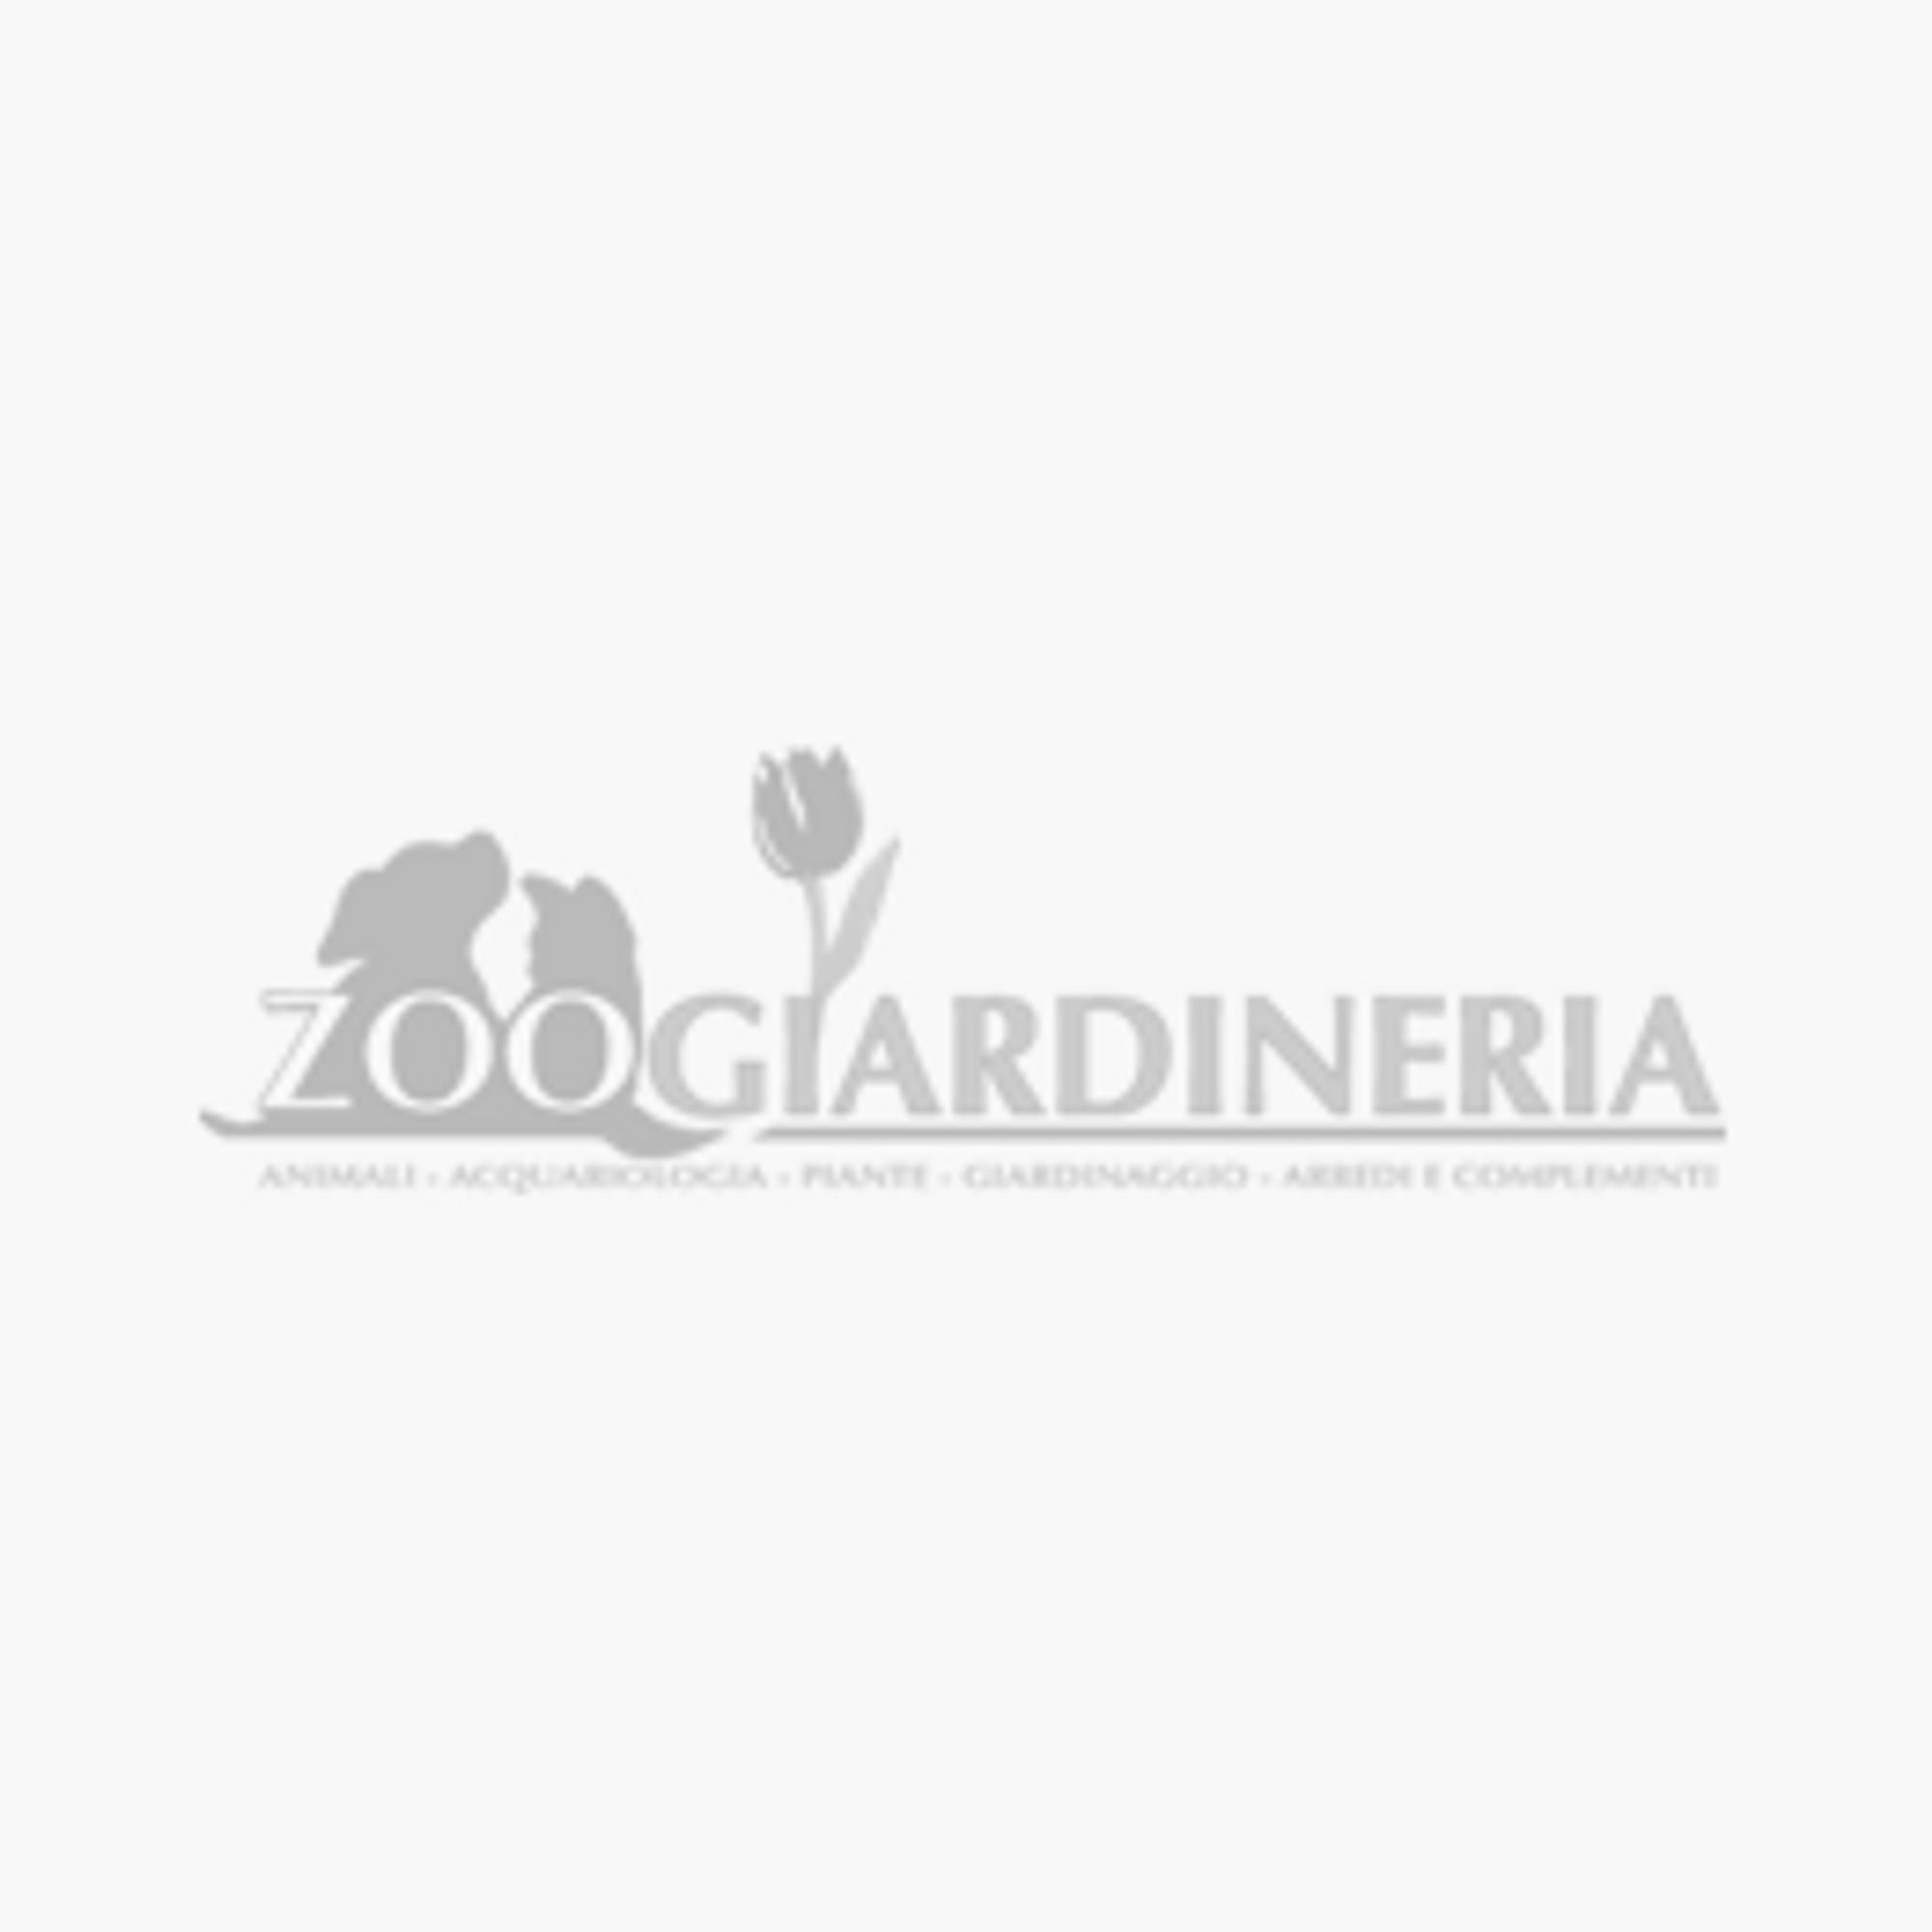 Stocker Padrafix Spago Biodegradabile